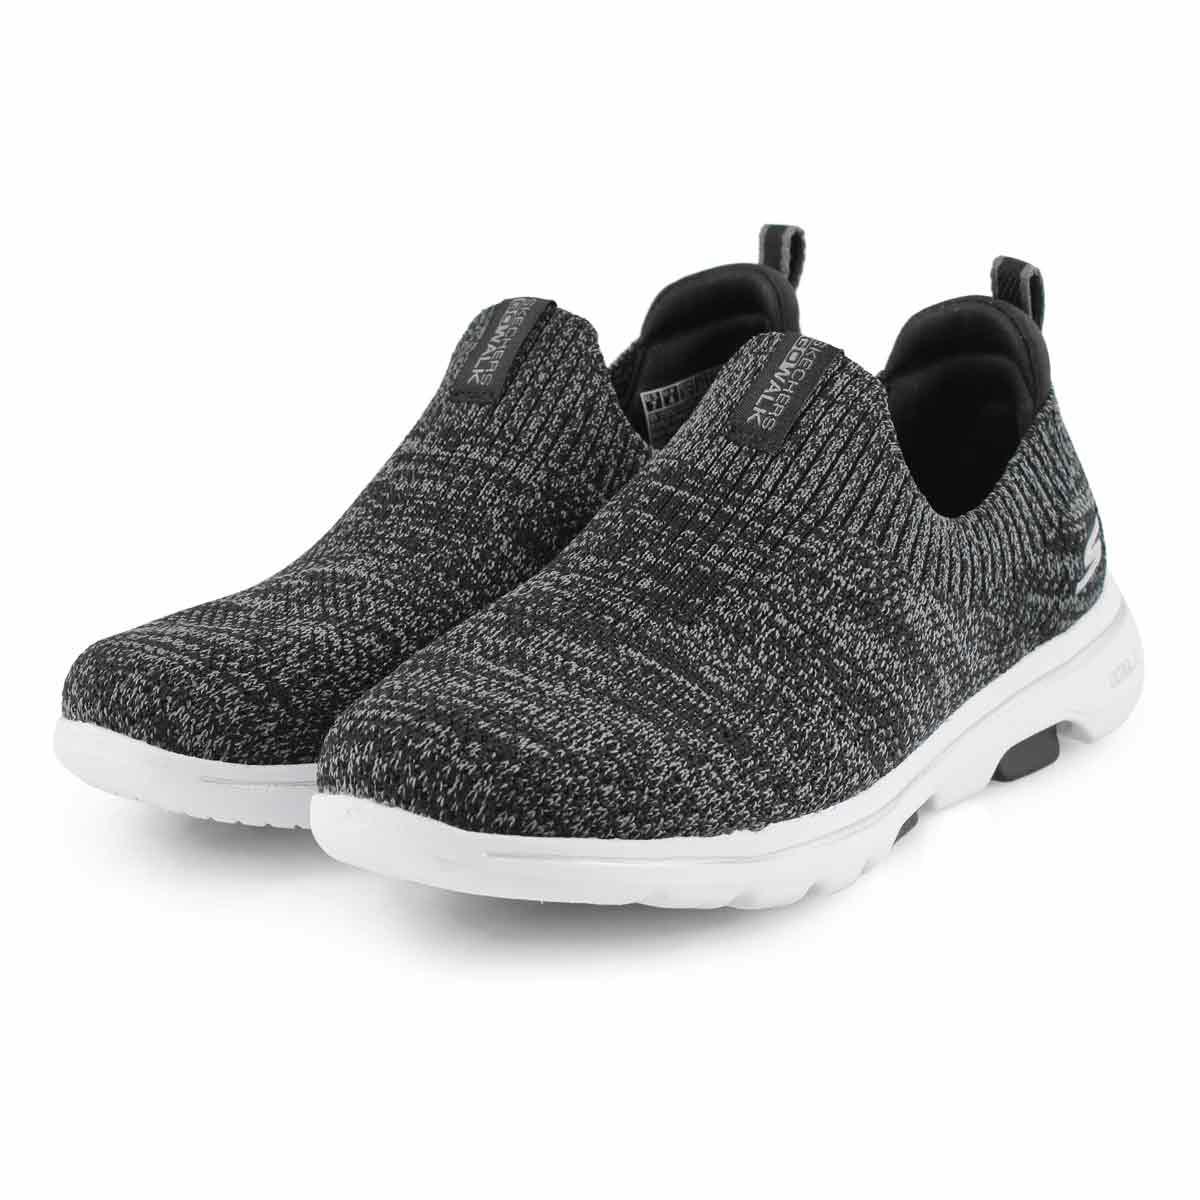 Lds GOwalk 5 Trendy bk/gy slip on shoe